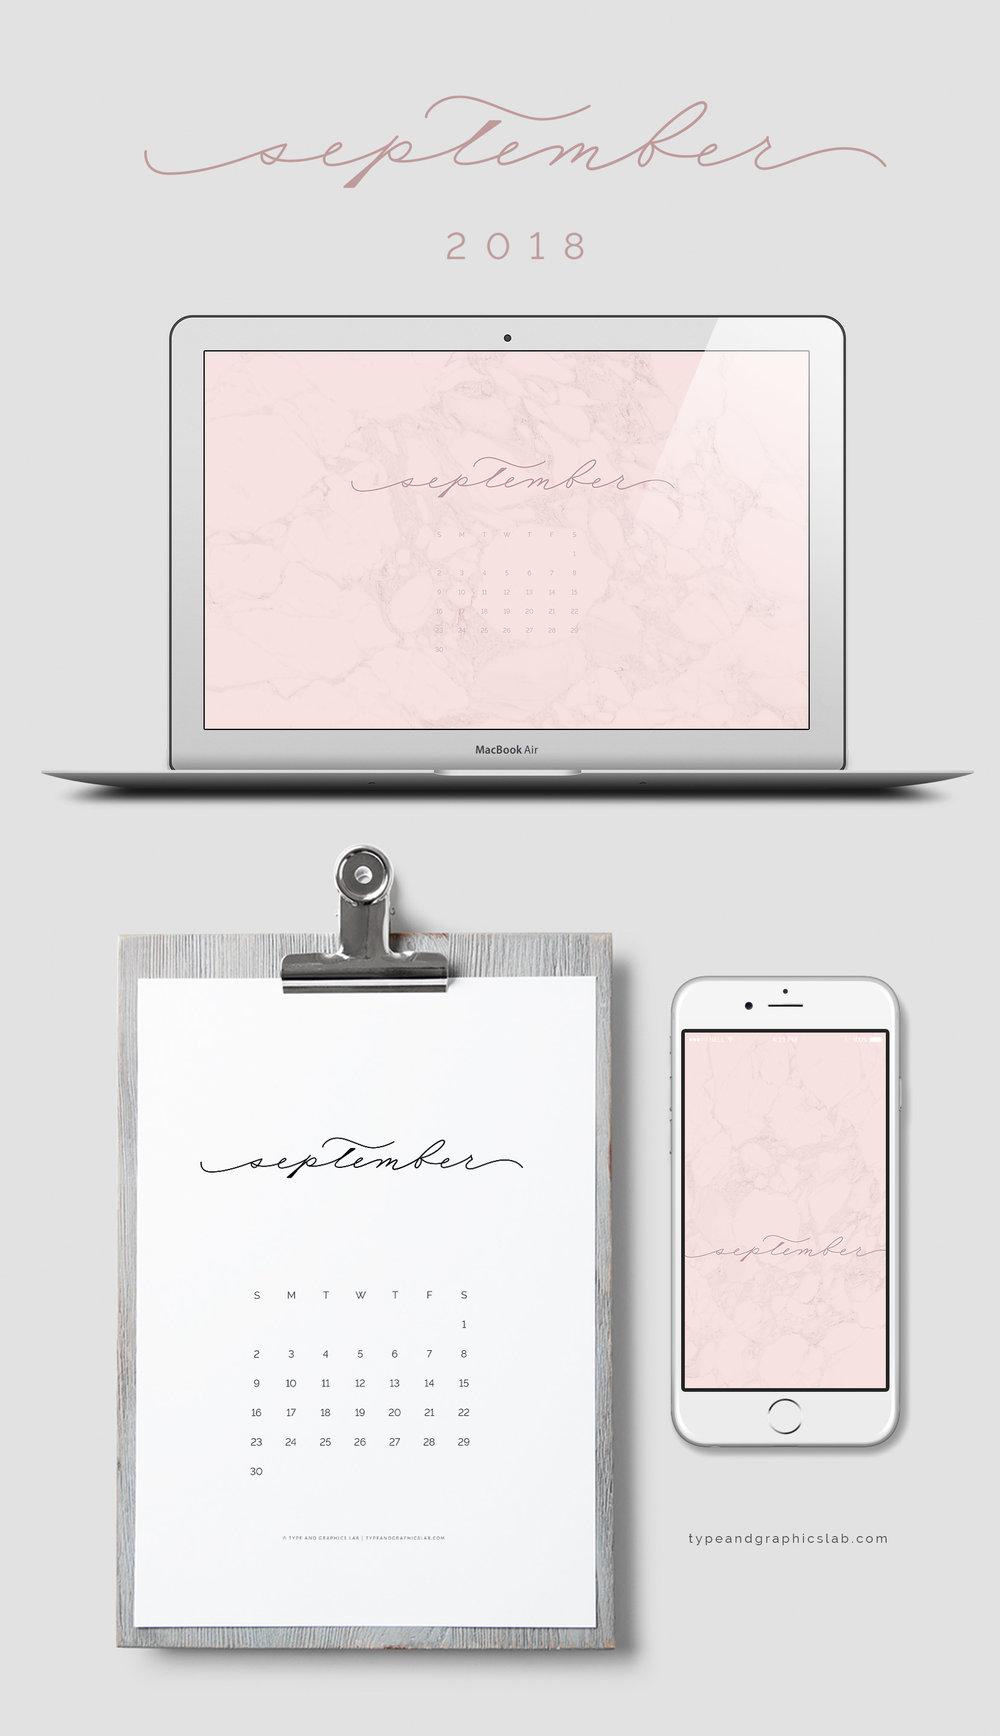 Download free desktop, mobile, and printable calendar for September 2018 |©typeandgraphicslab.com | For personal use only